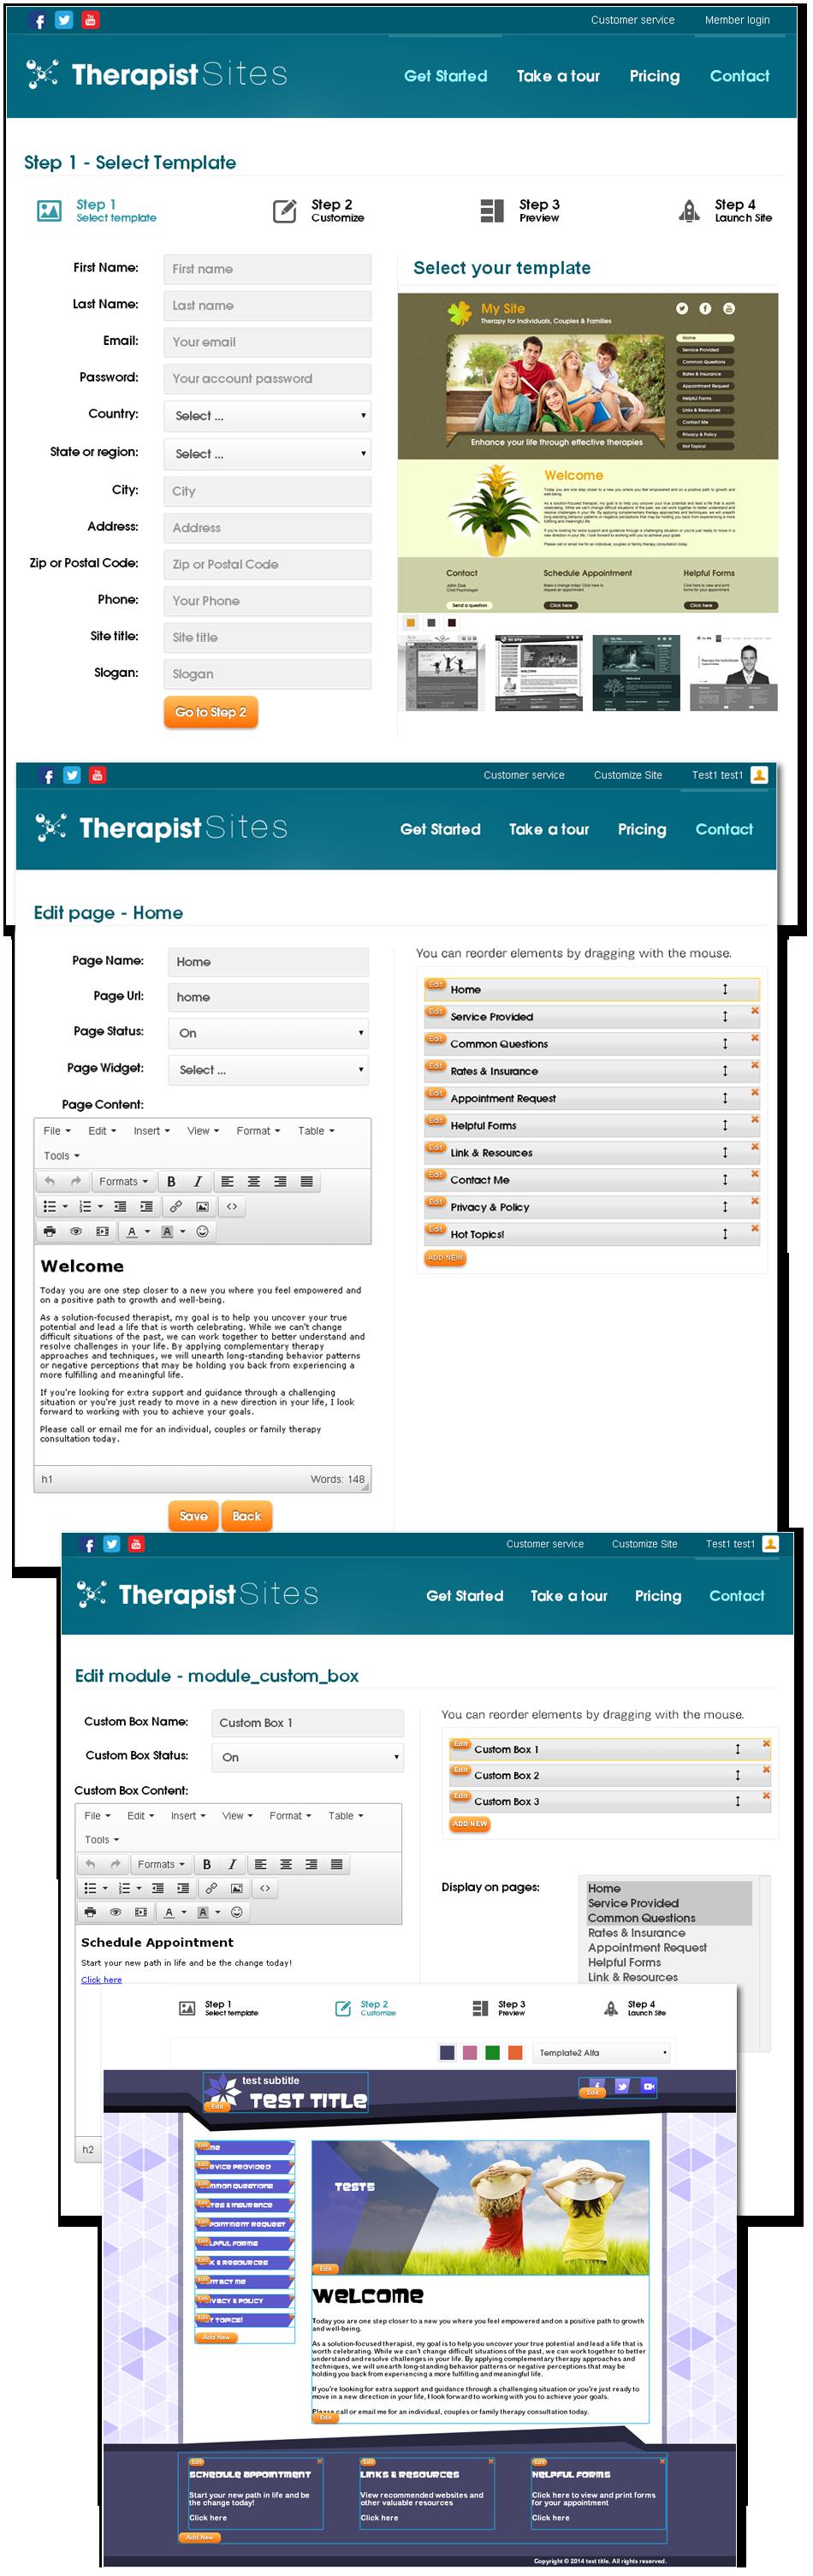 Therapist Sites